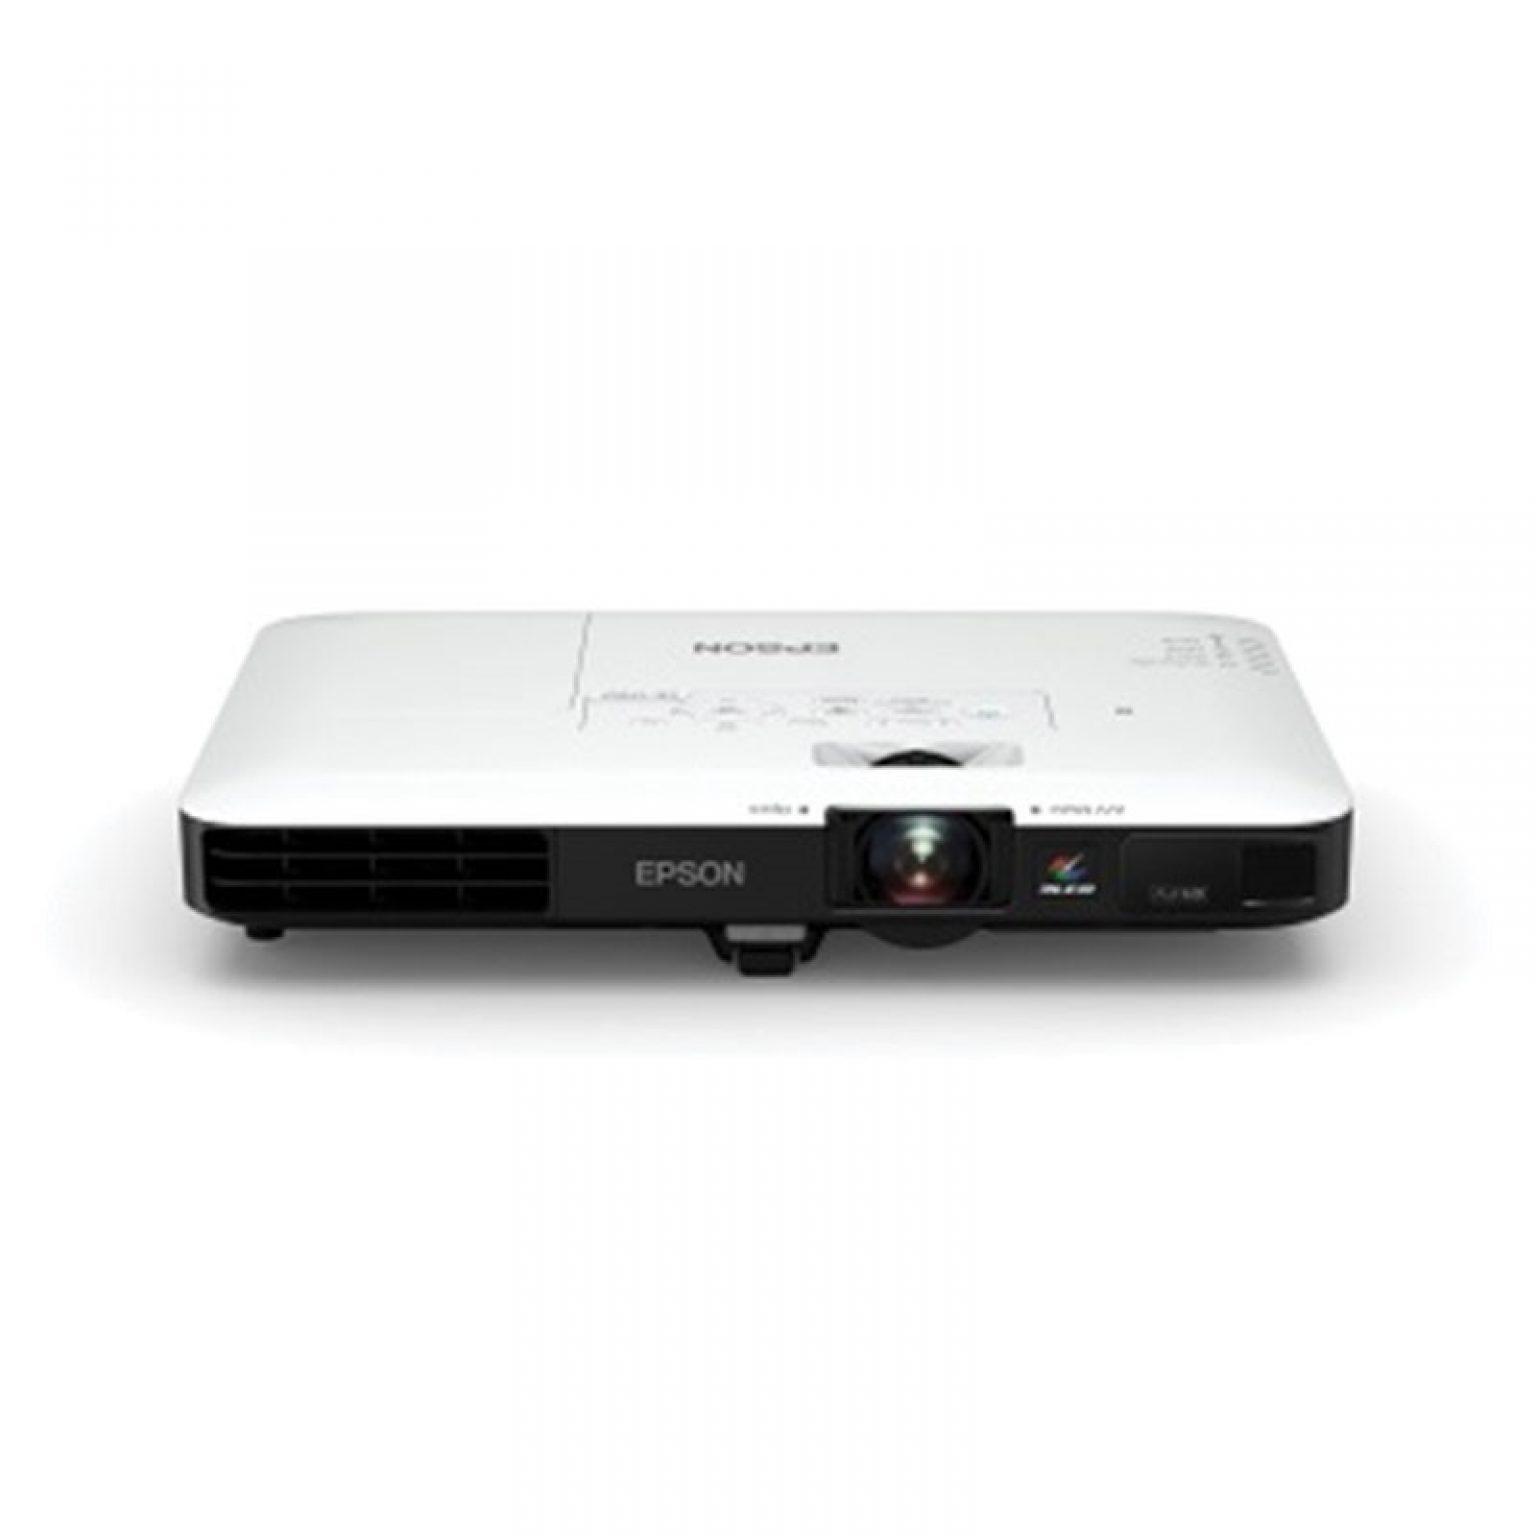 EPSON - Projector EB-1785W